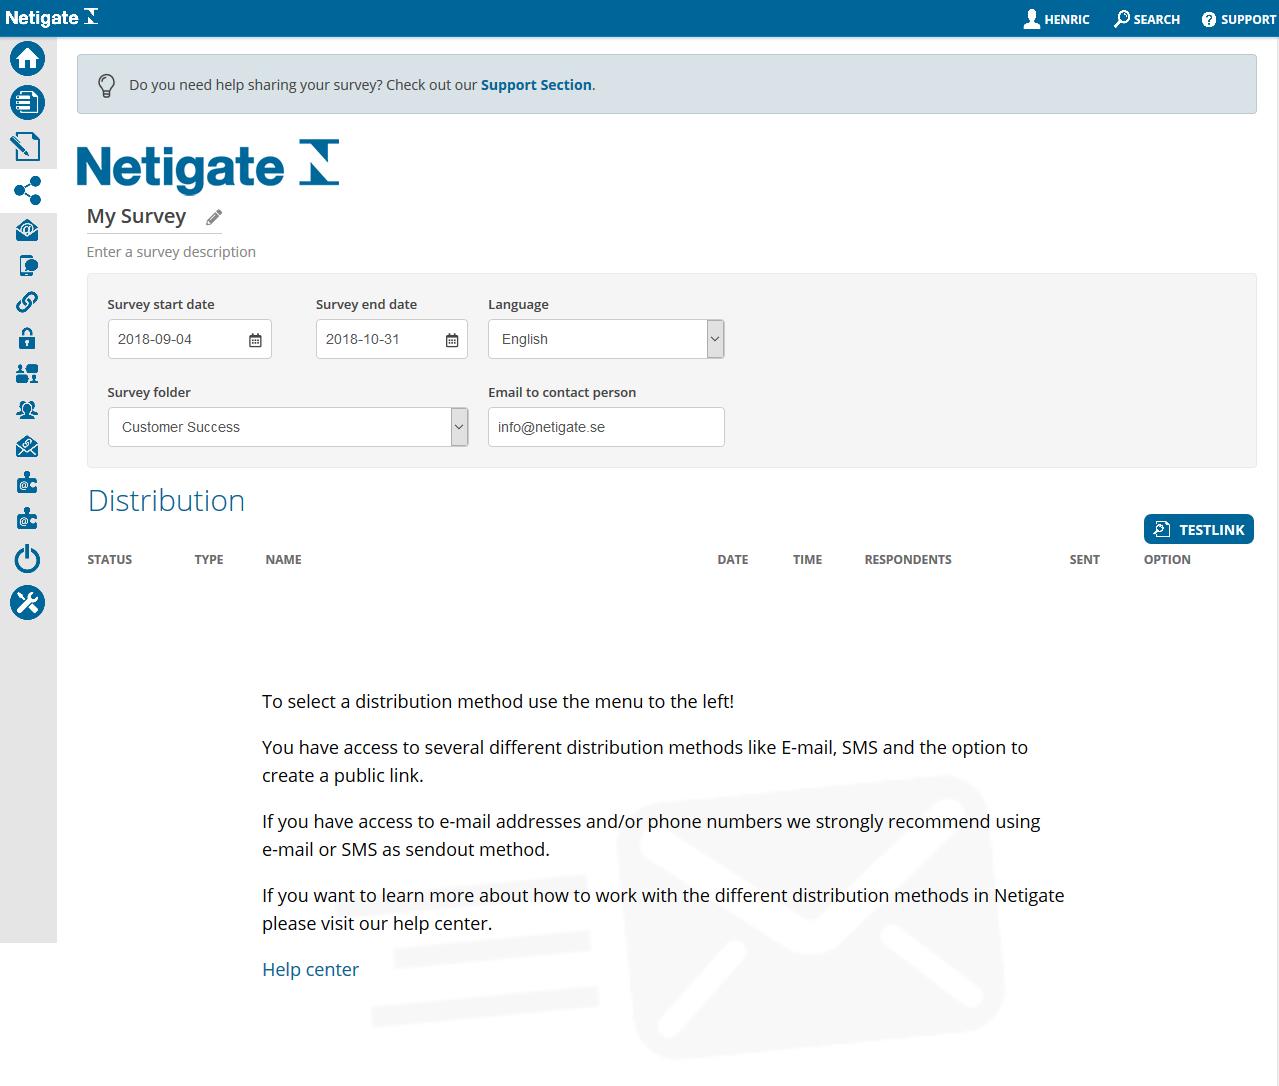 Distribution page